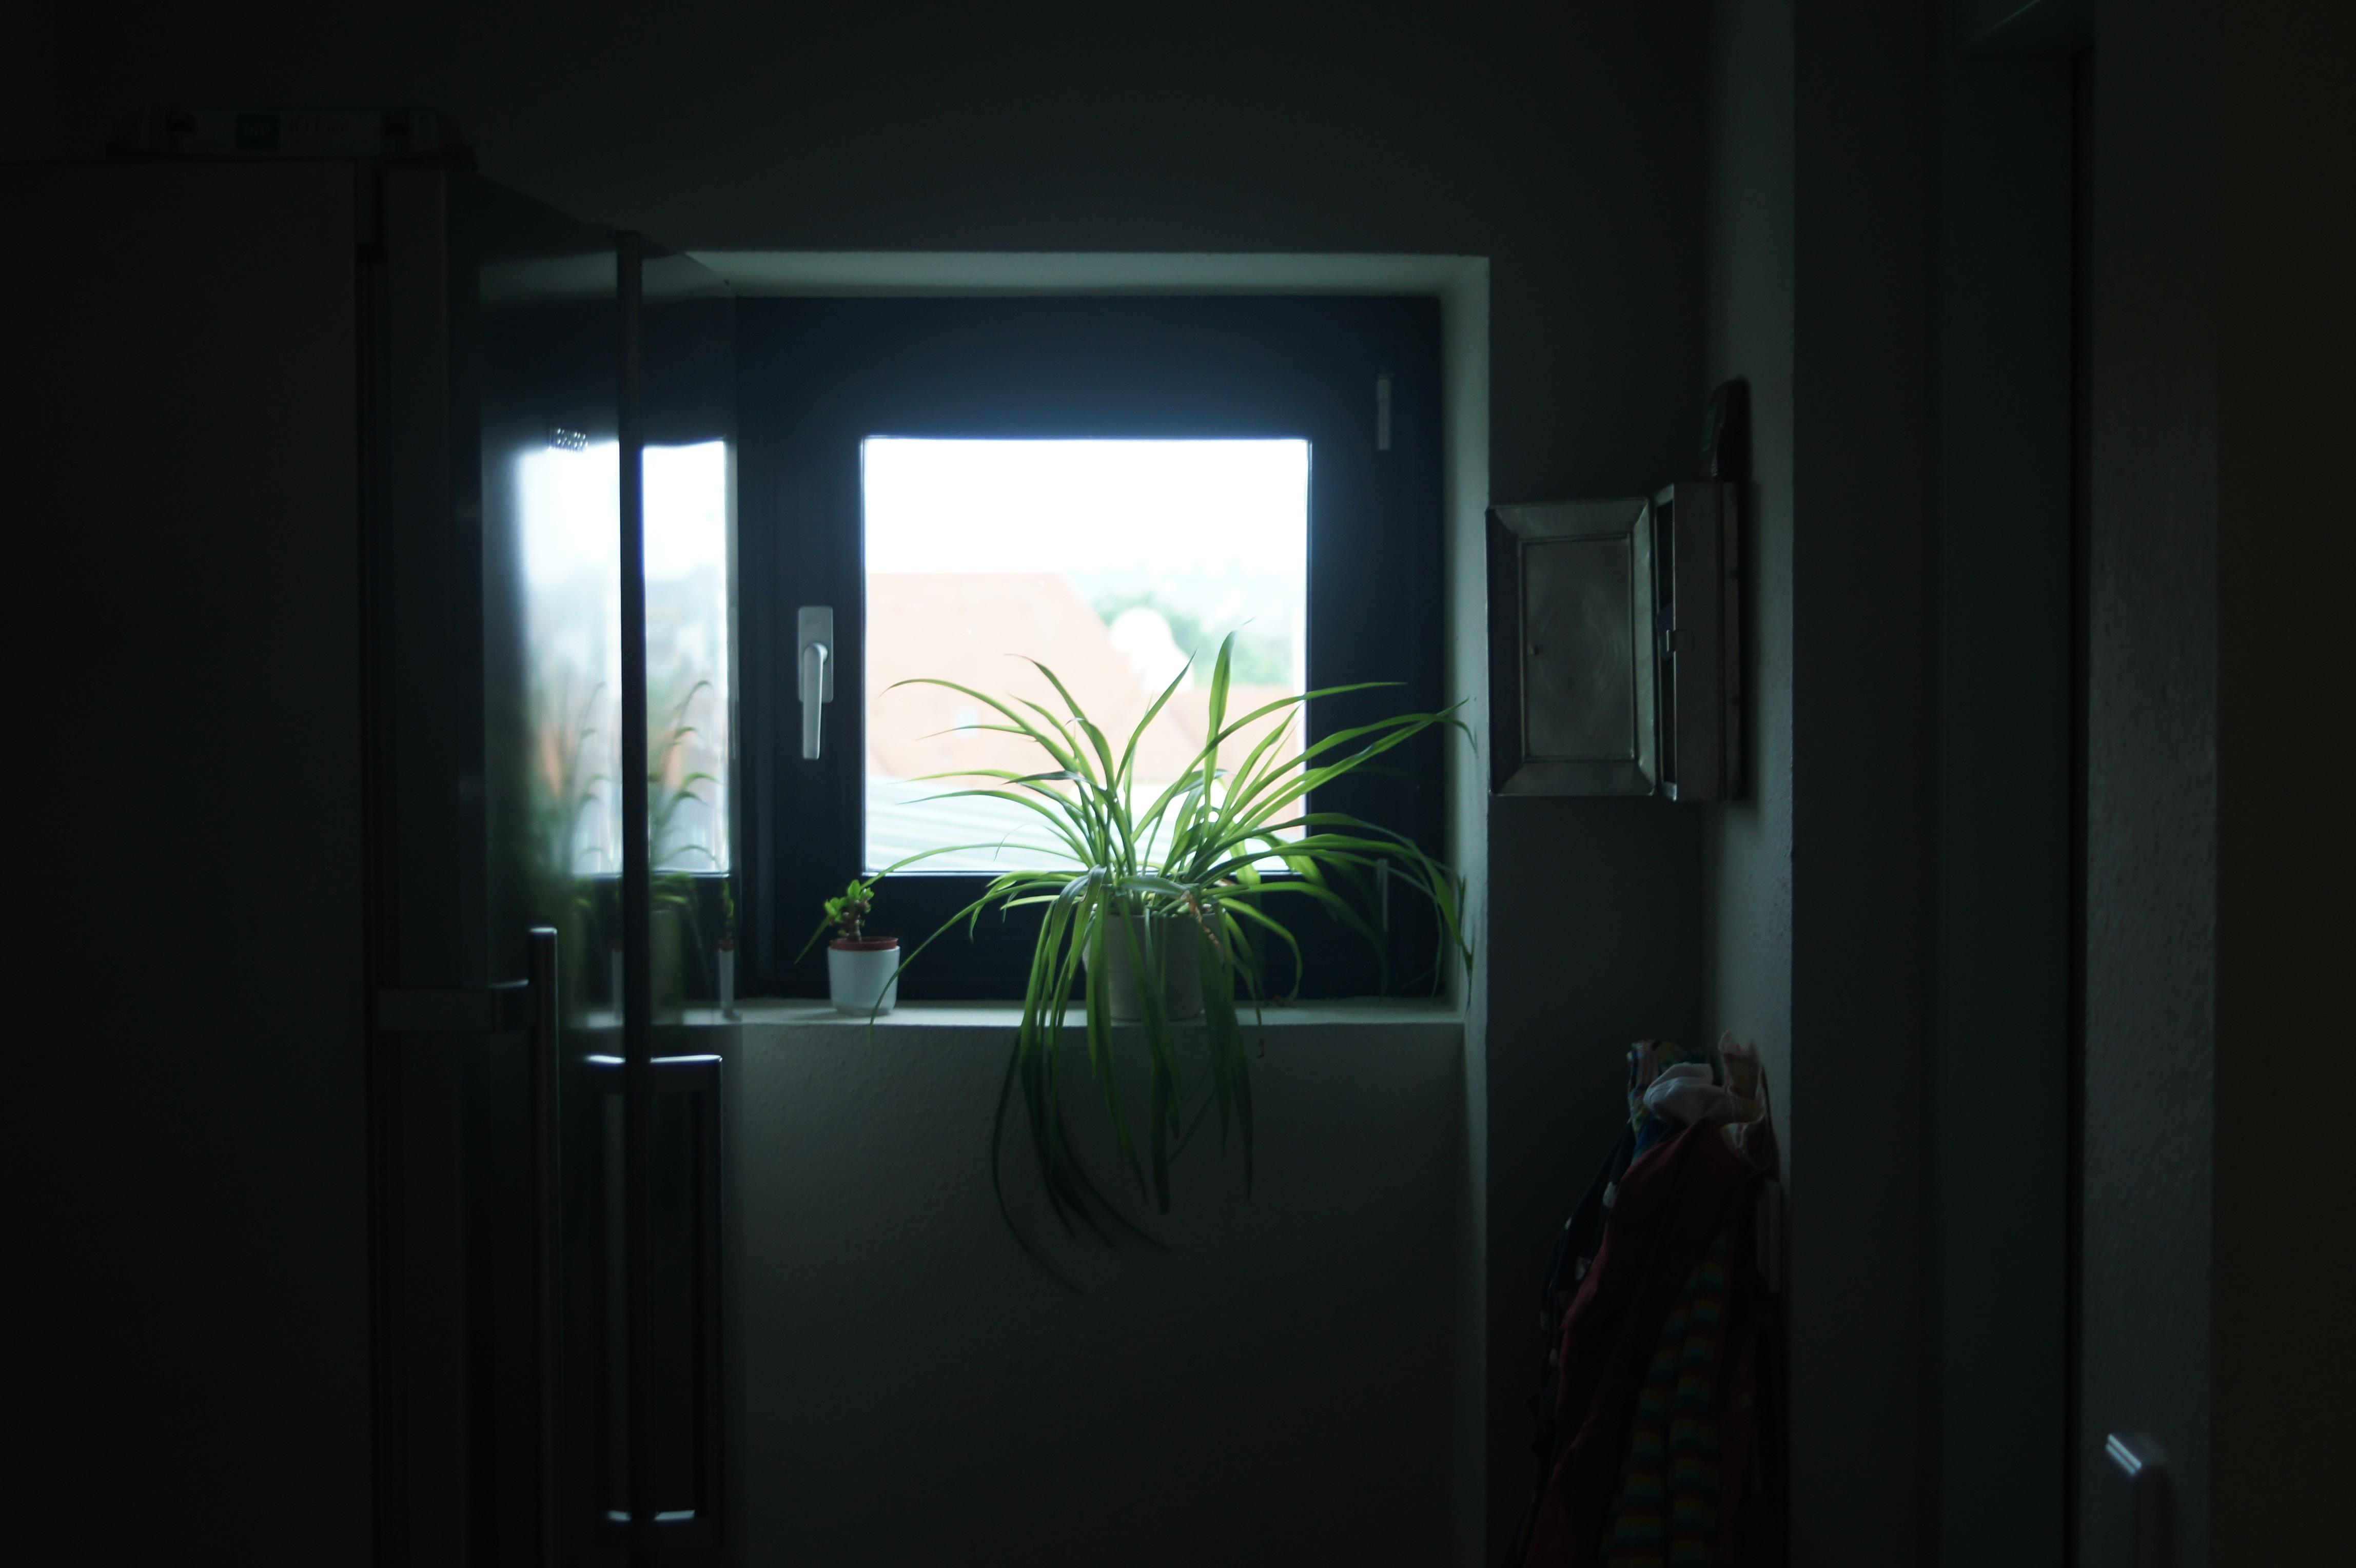 green linear leafed plant near window